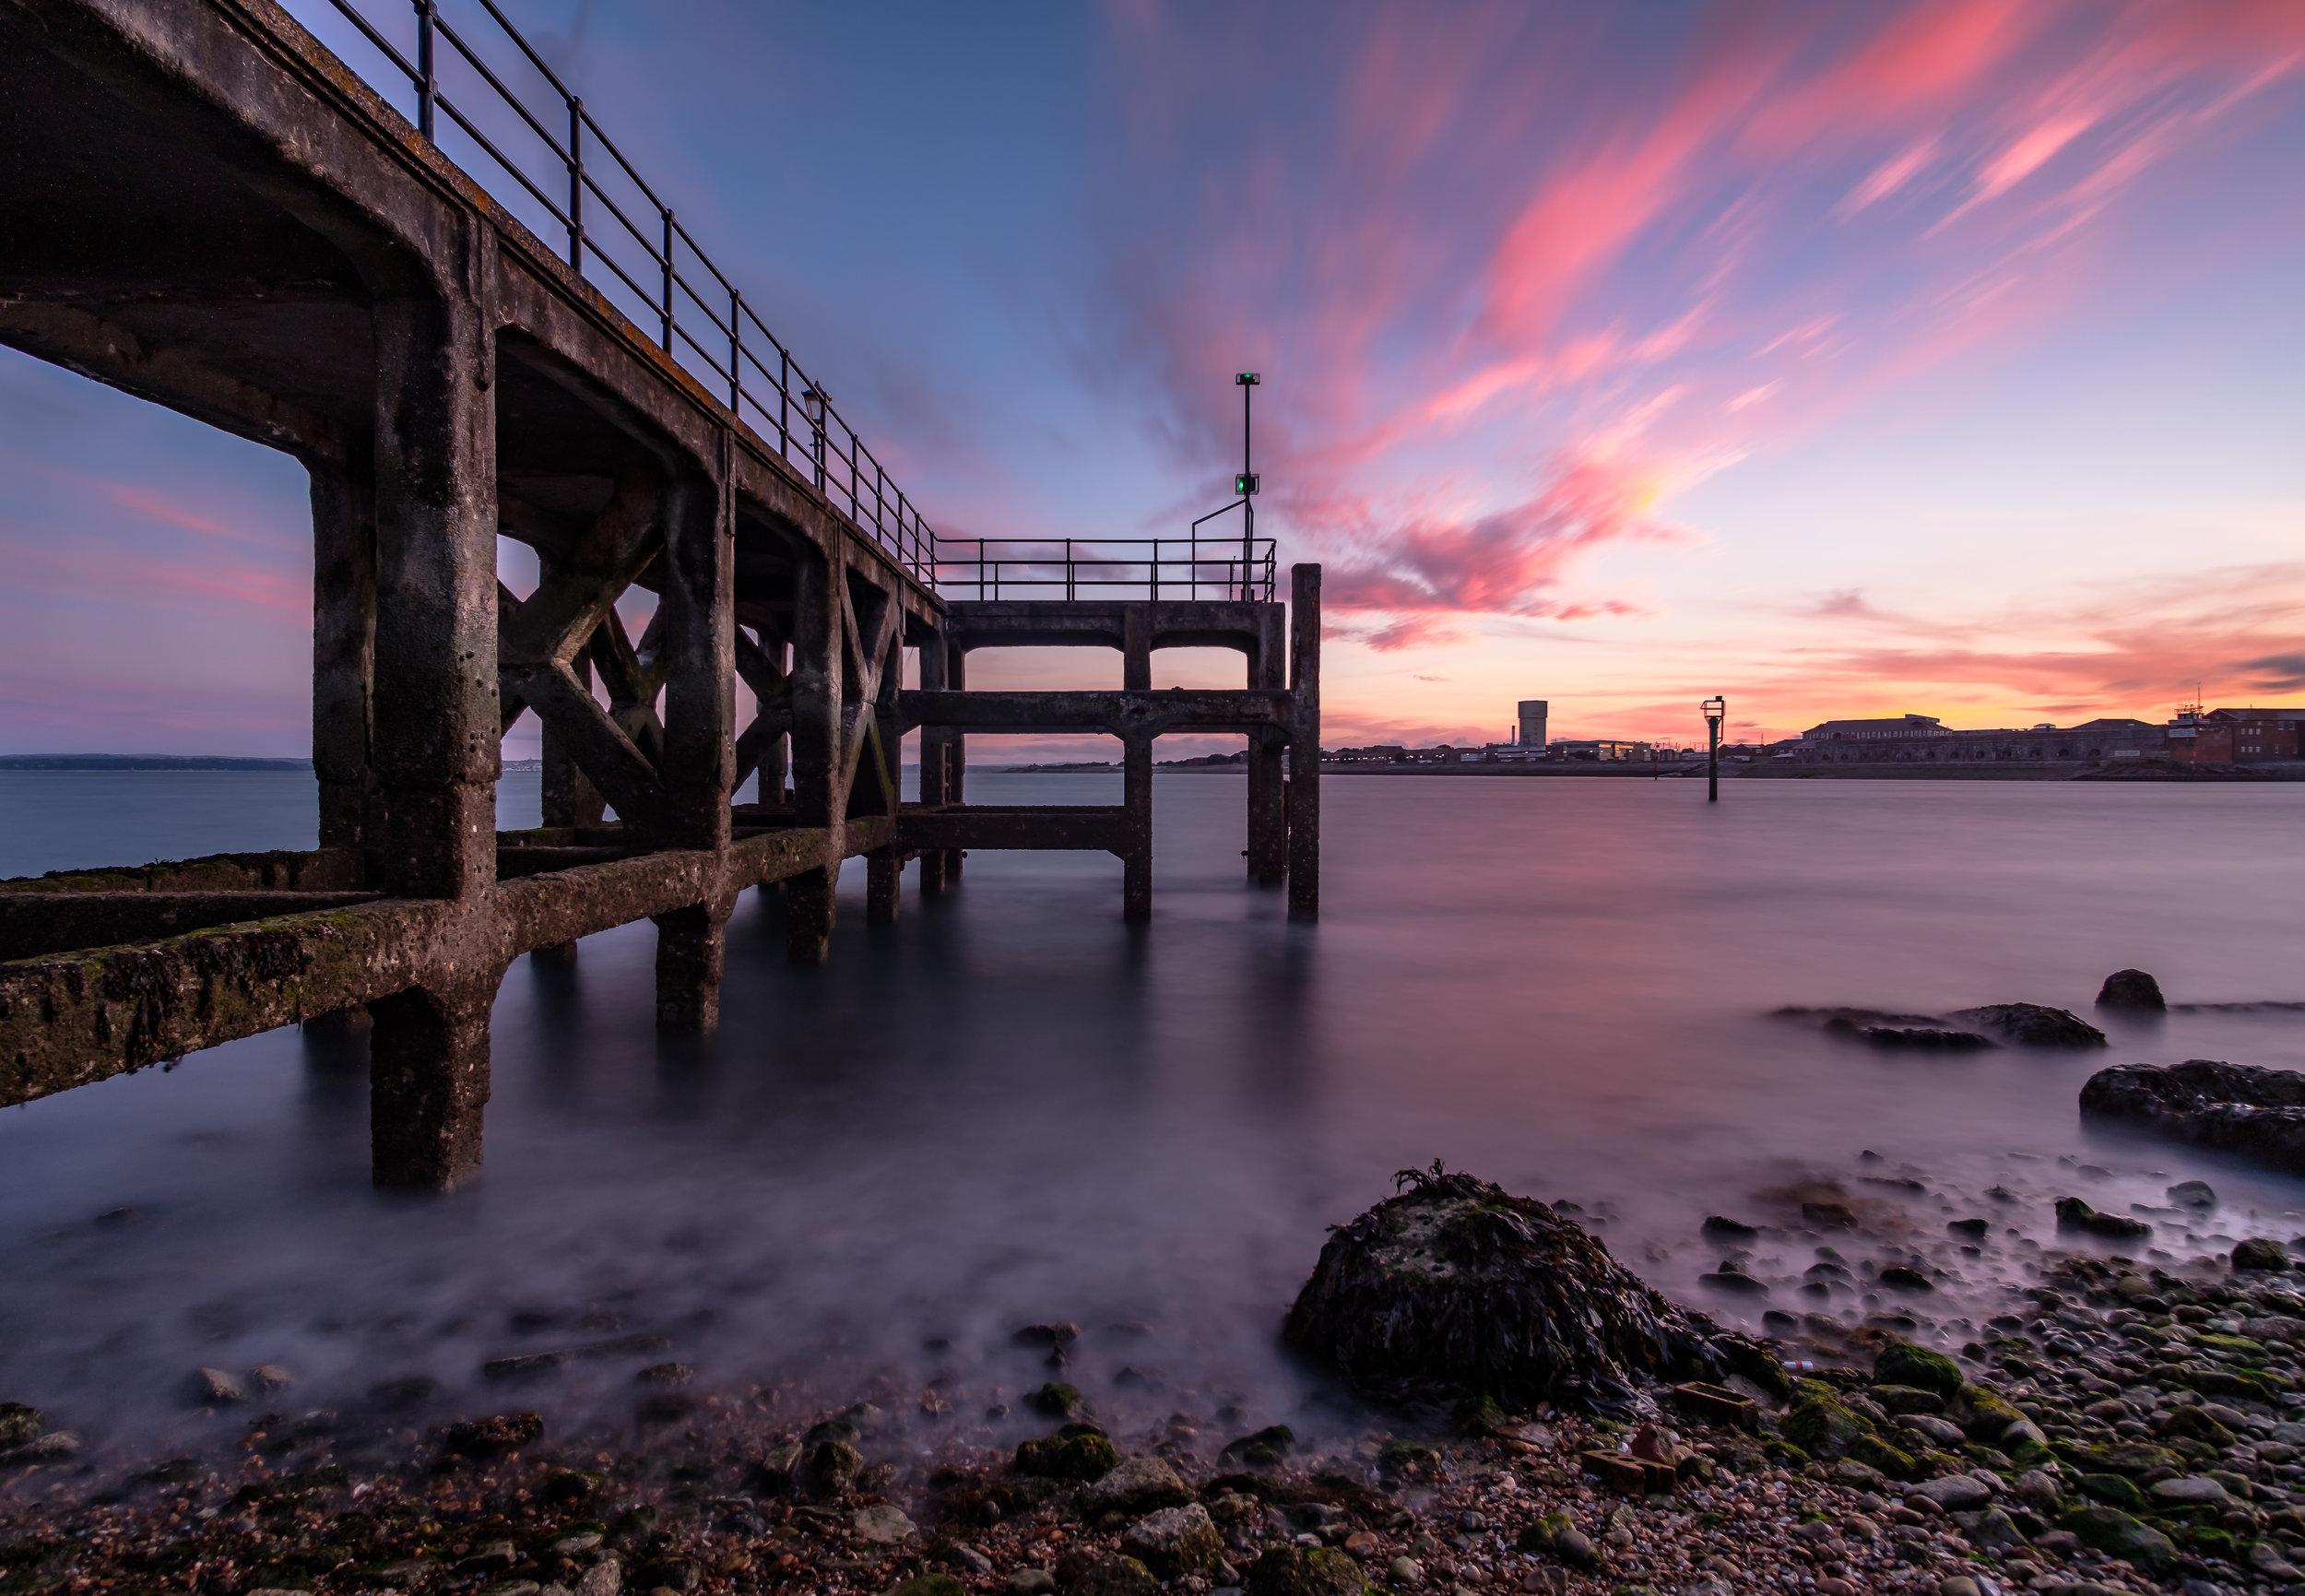 Sunset at Victoria Pier - Old Portsmouth, UK